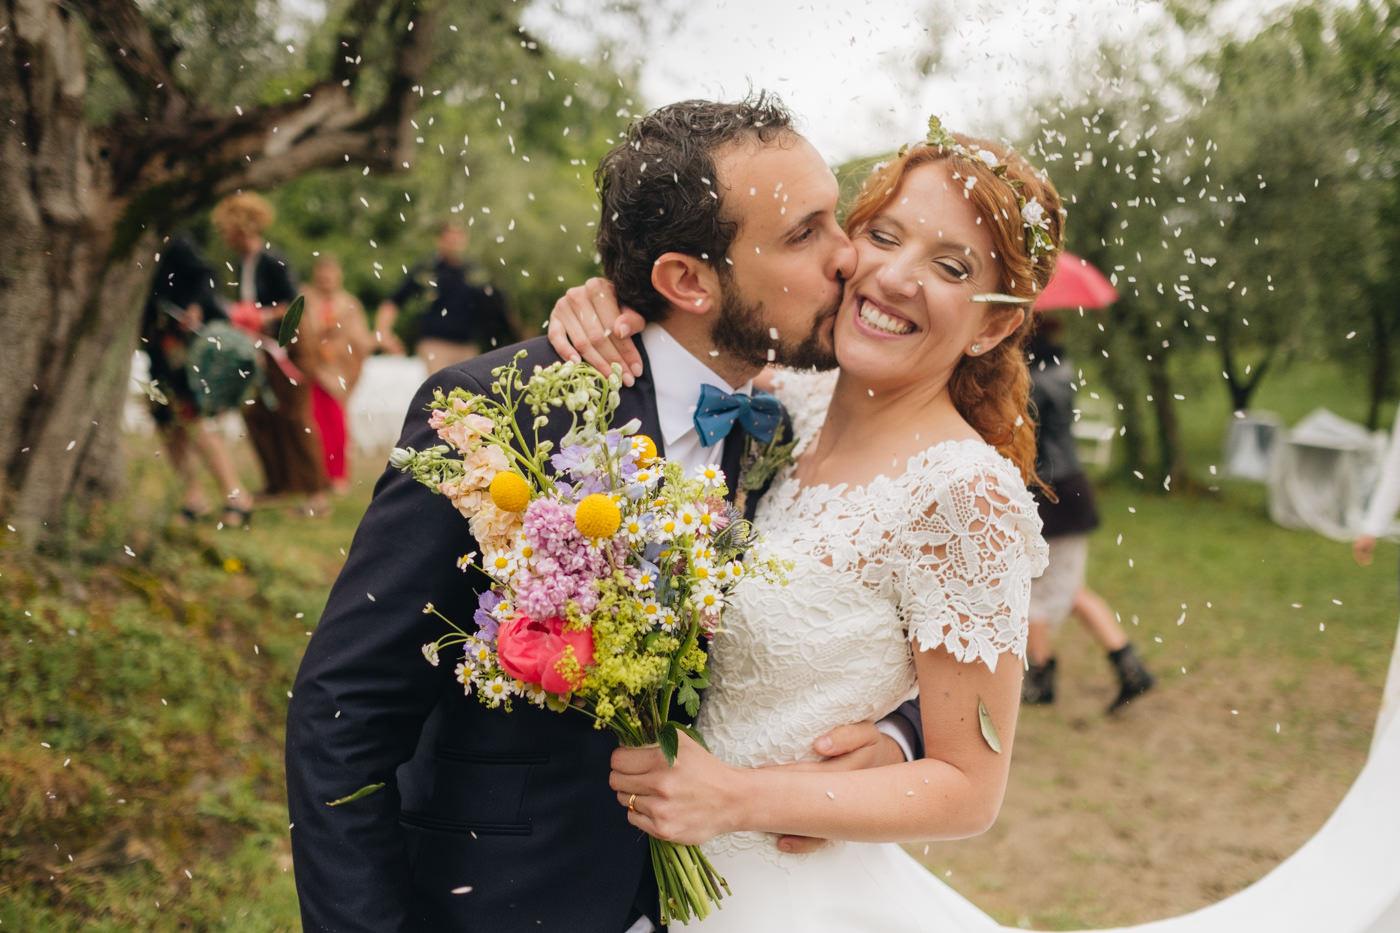 matrimoni_all_italiana_fotografo_matrimonio_toscana-48.jpg